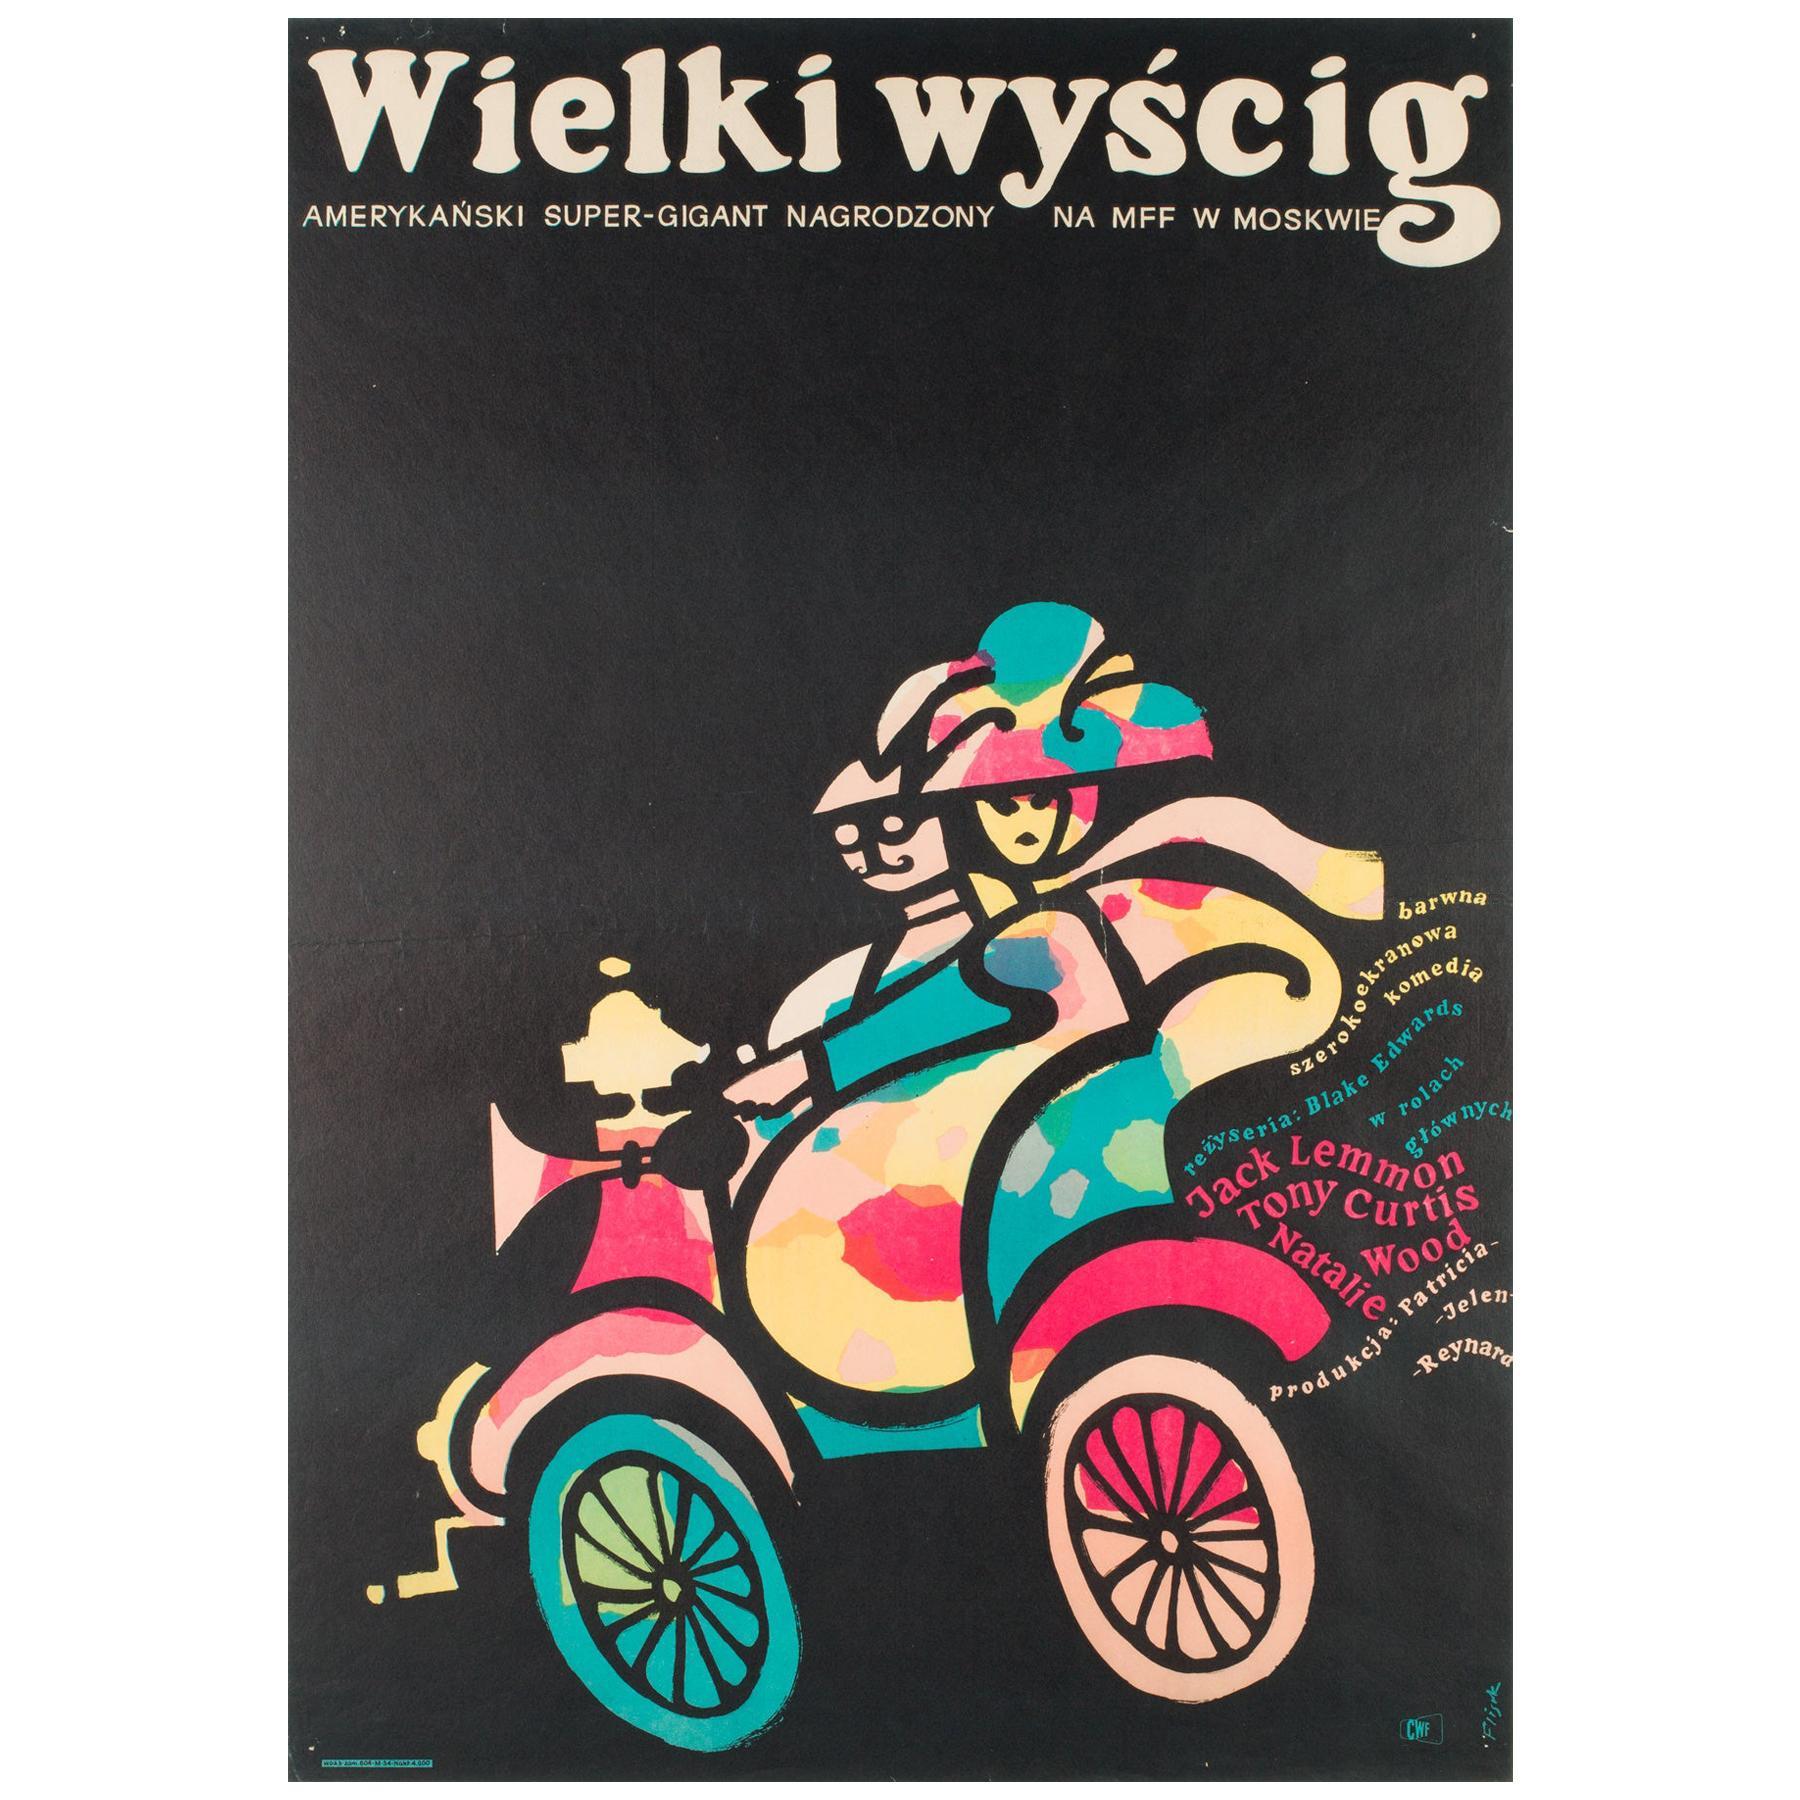 The Great Race Original Vintage Polish Film Poster, Jerzy Flisak 1966